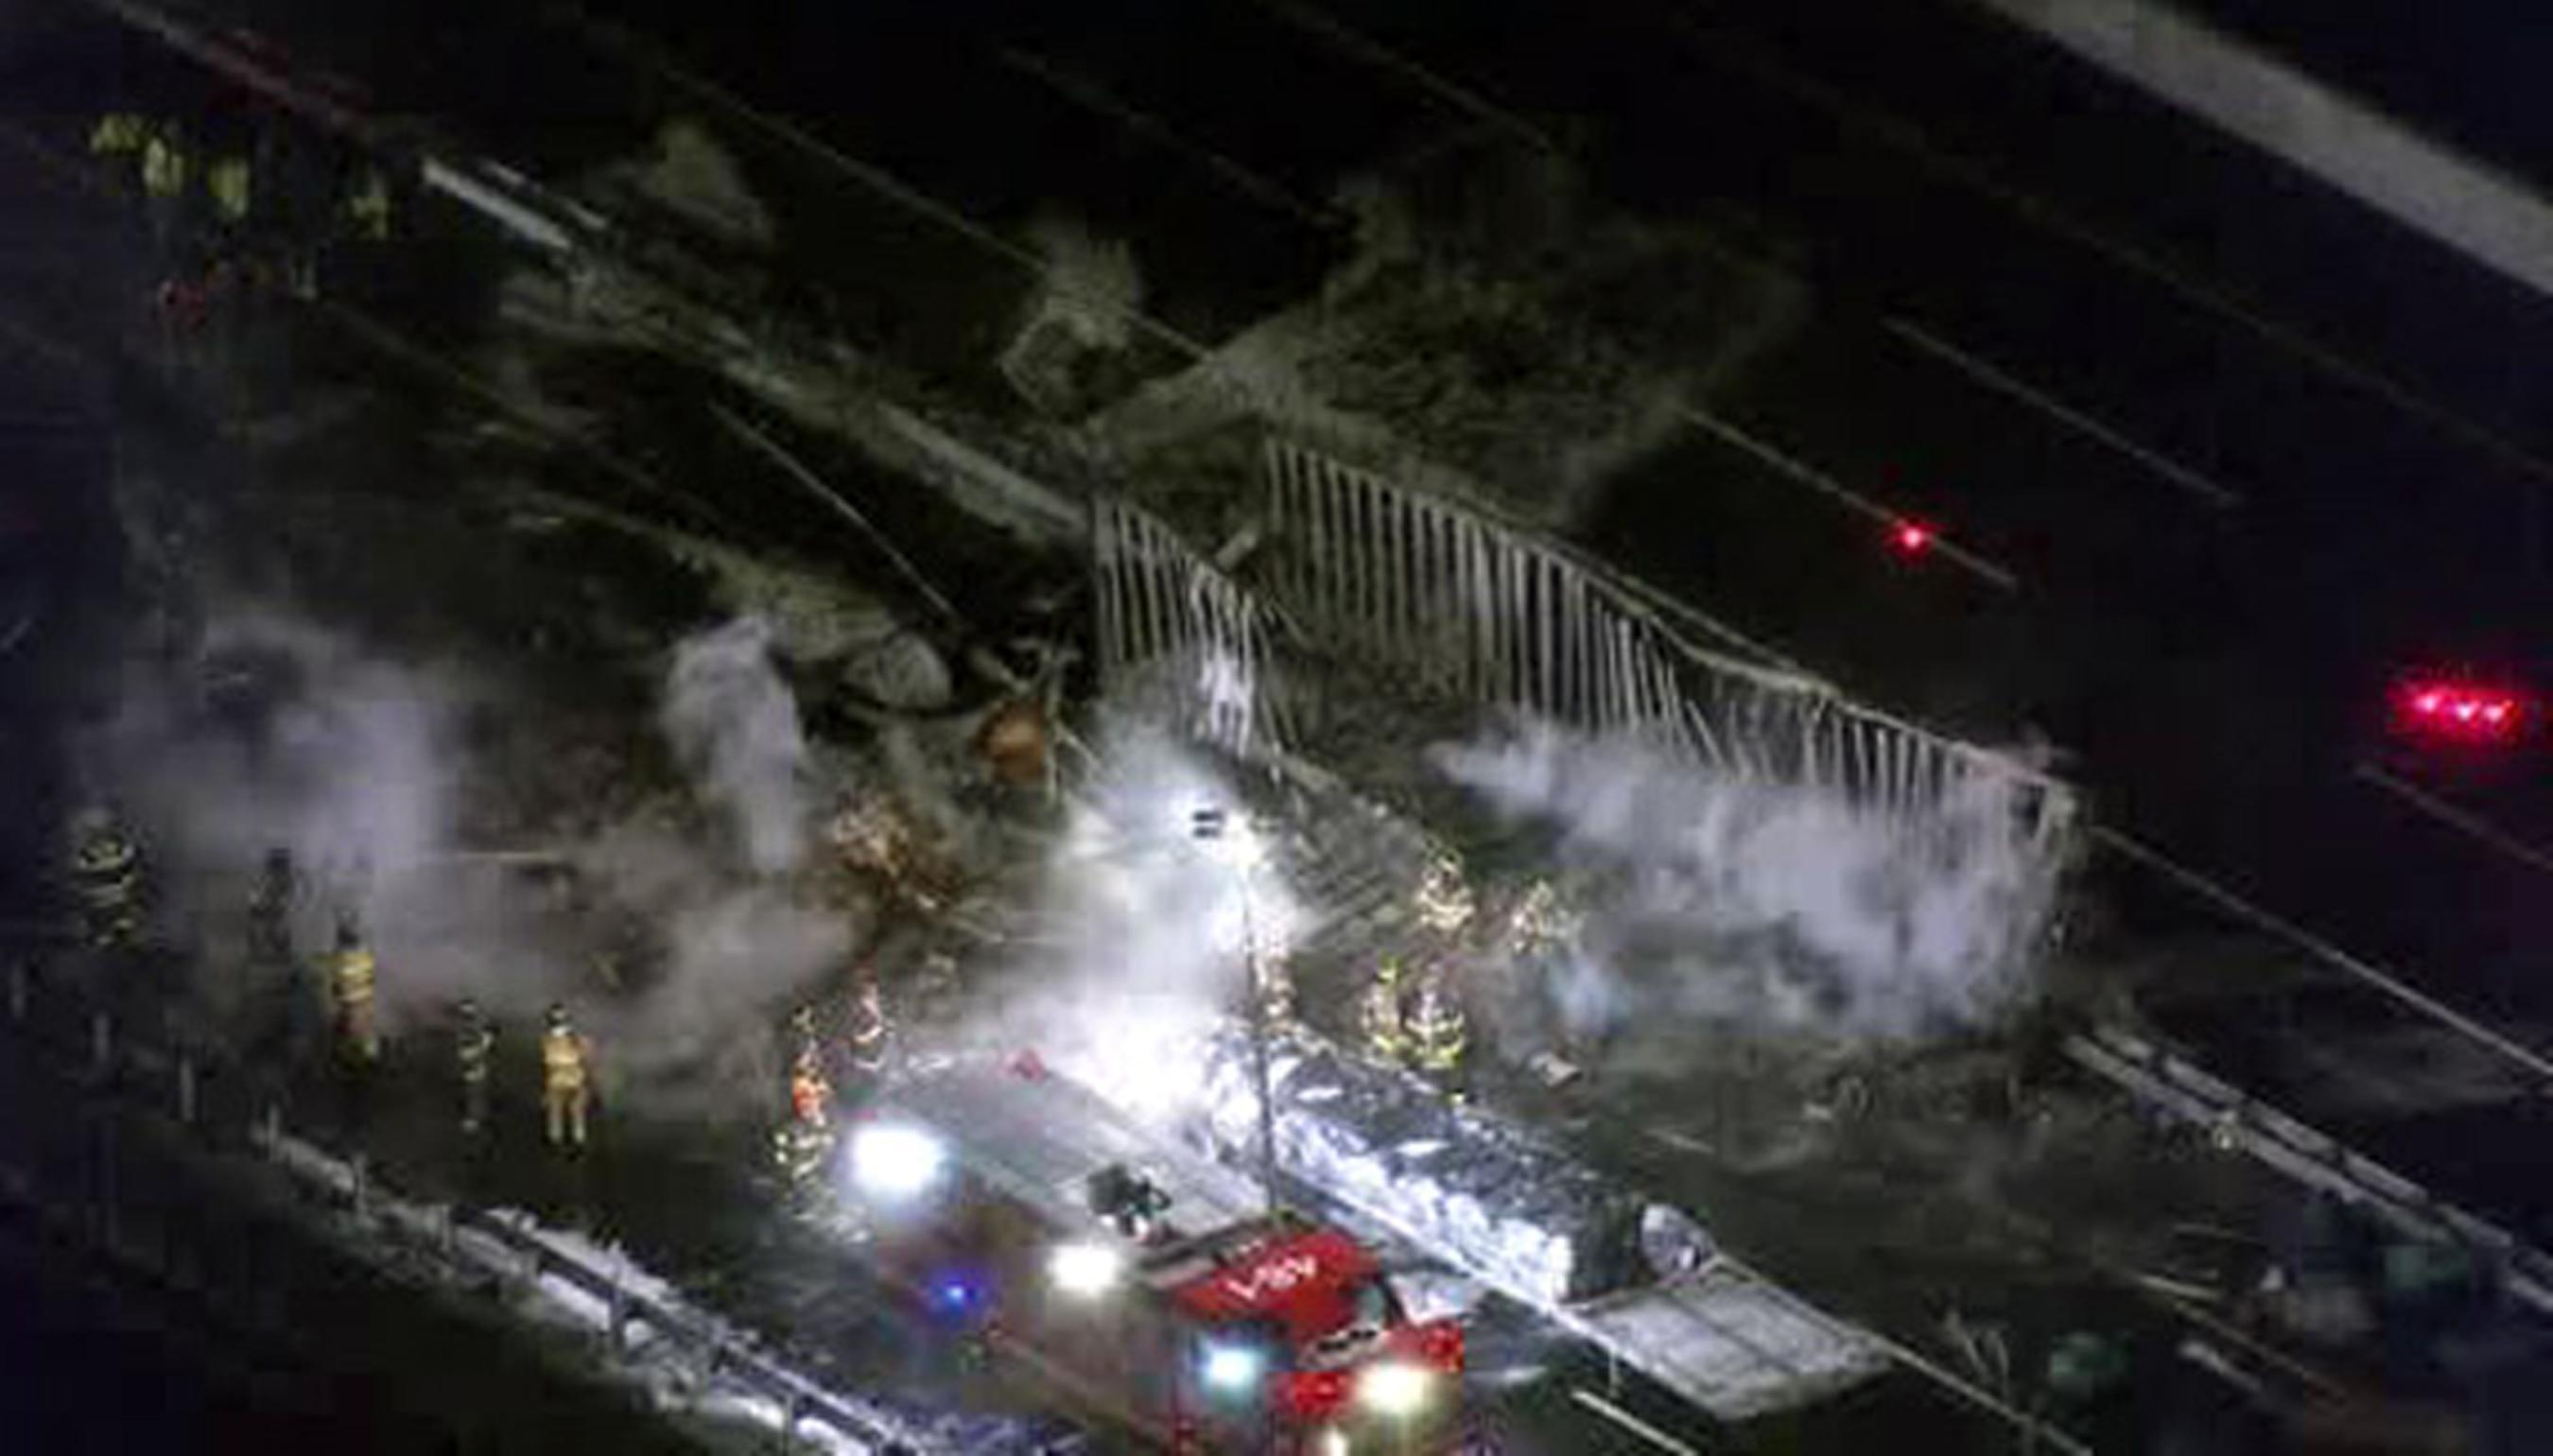 Delaware trucker killed in NJ Turnpike crash - Washington Times